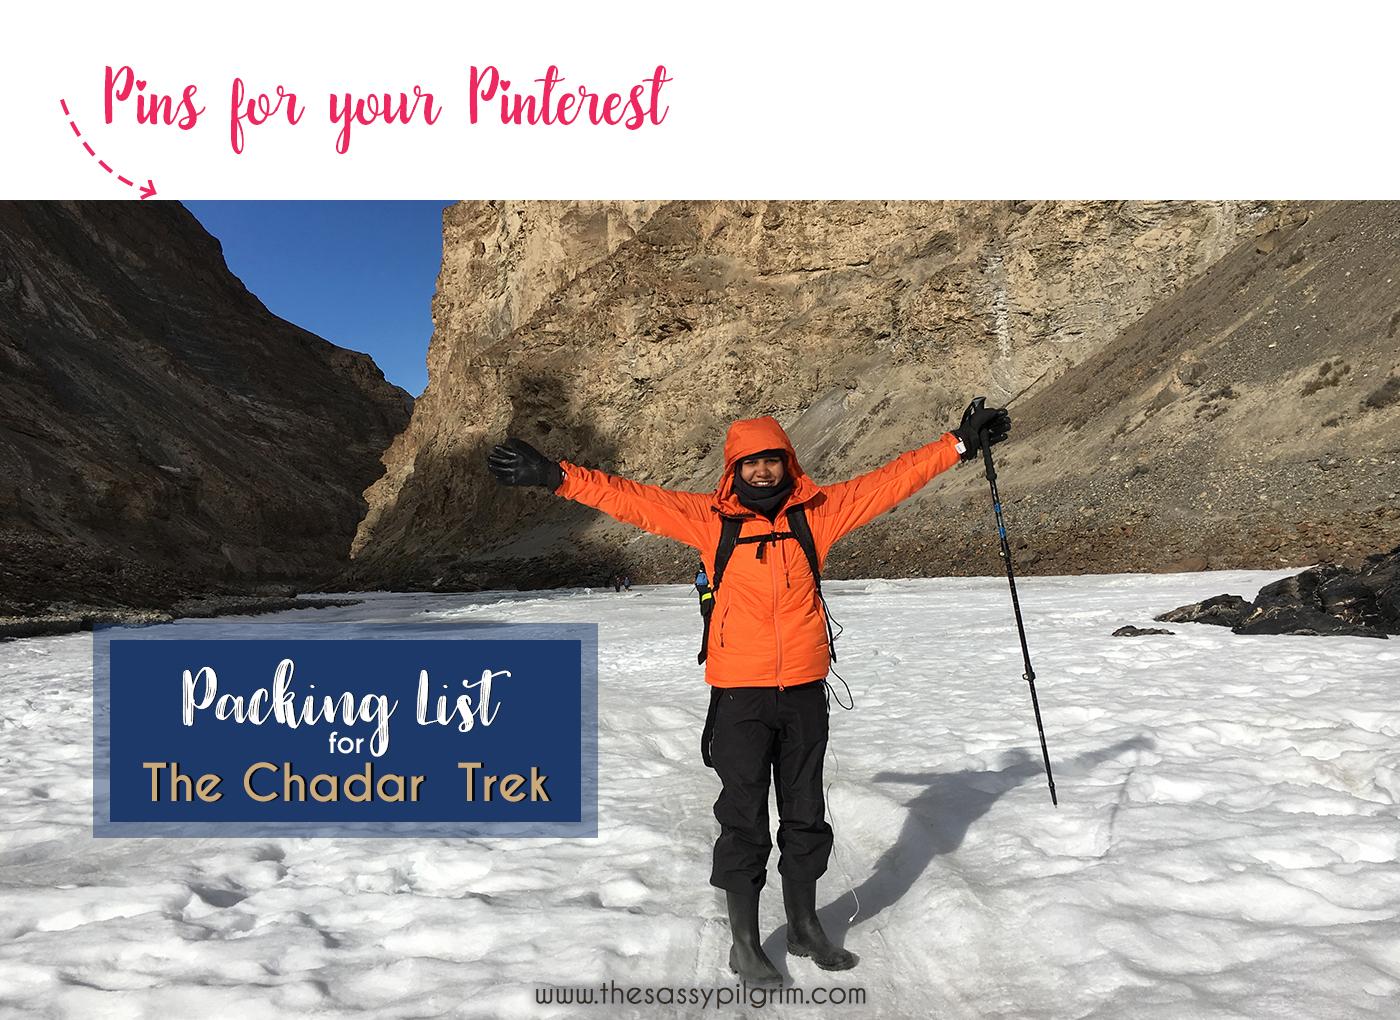 TheChadarTre_FrozenRiver_Zanskar_PhotoStory_Leh_Kashmir_India_TravelBlog_Blogger_SoloTrip_TheSassyPilgrim